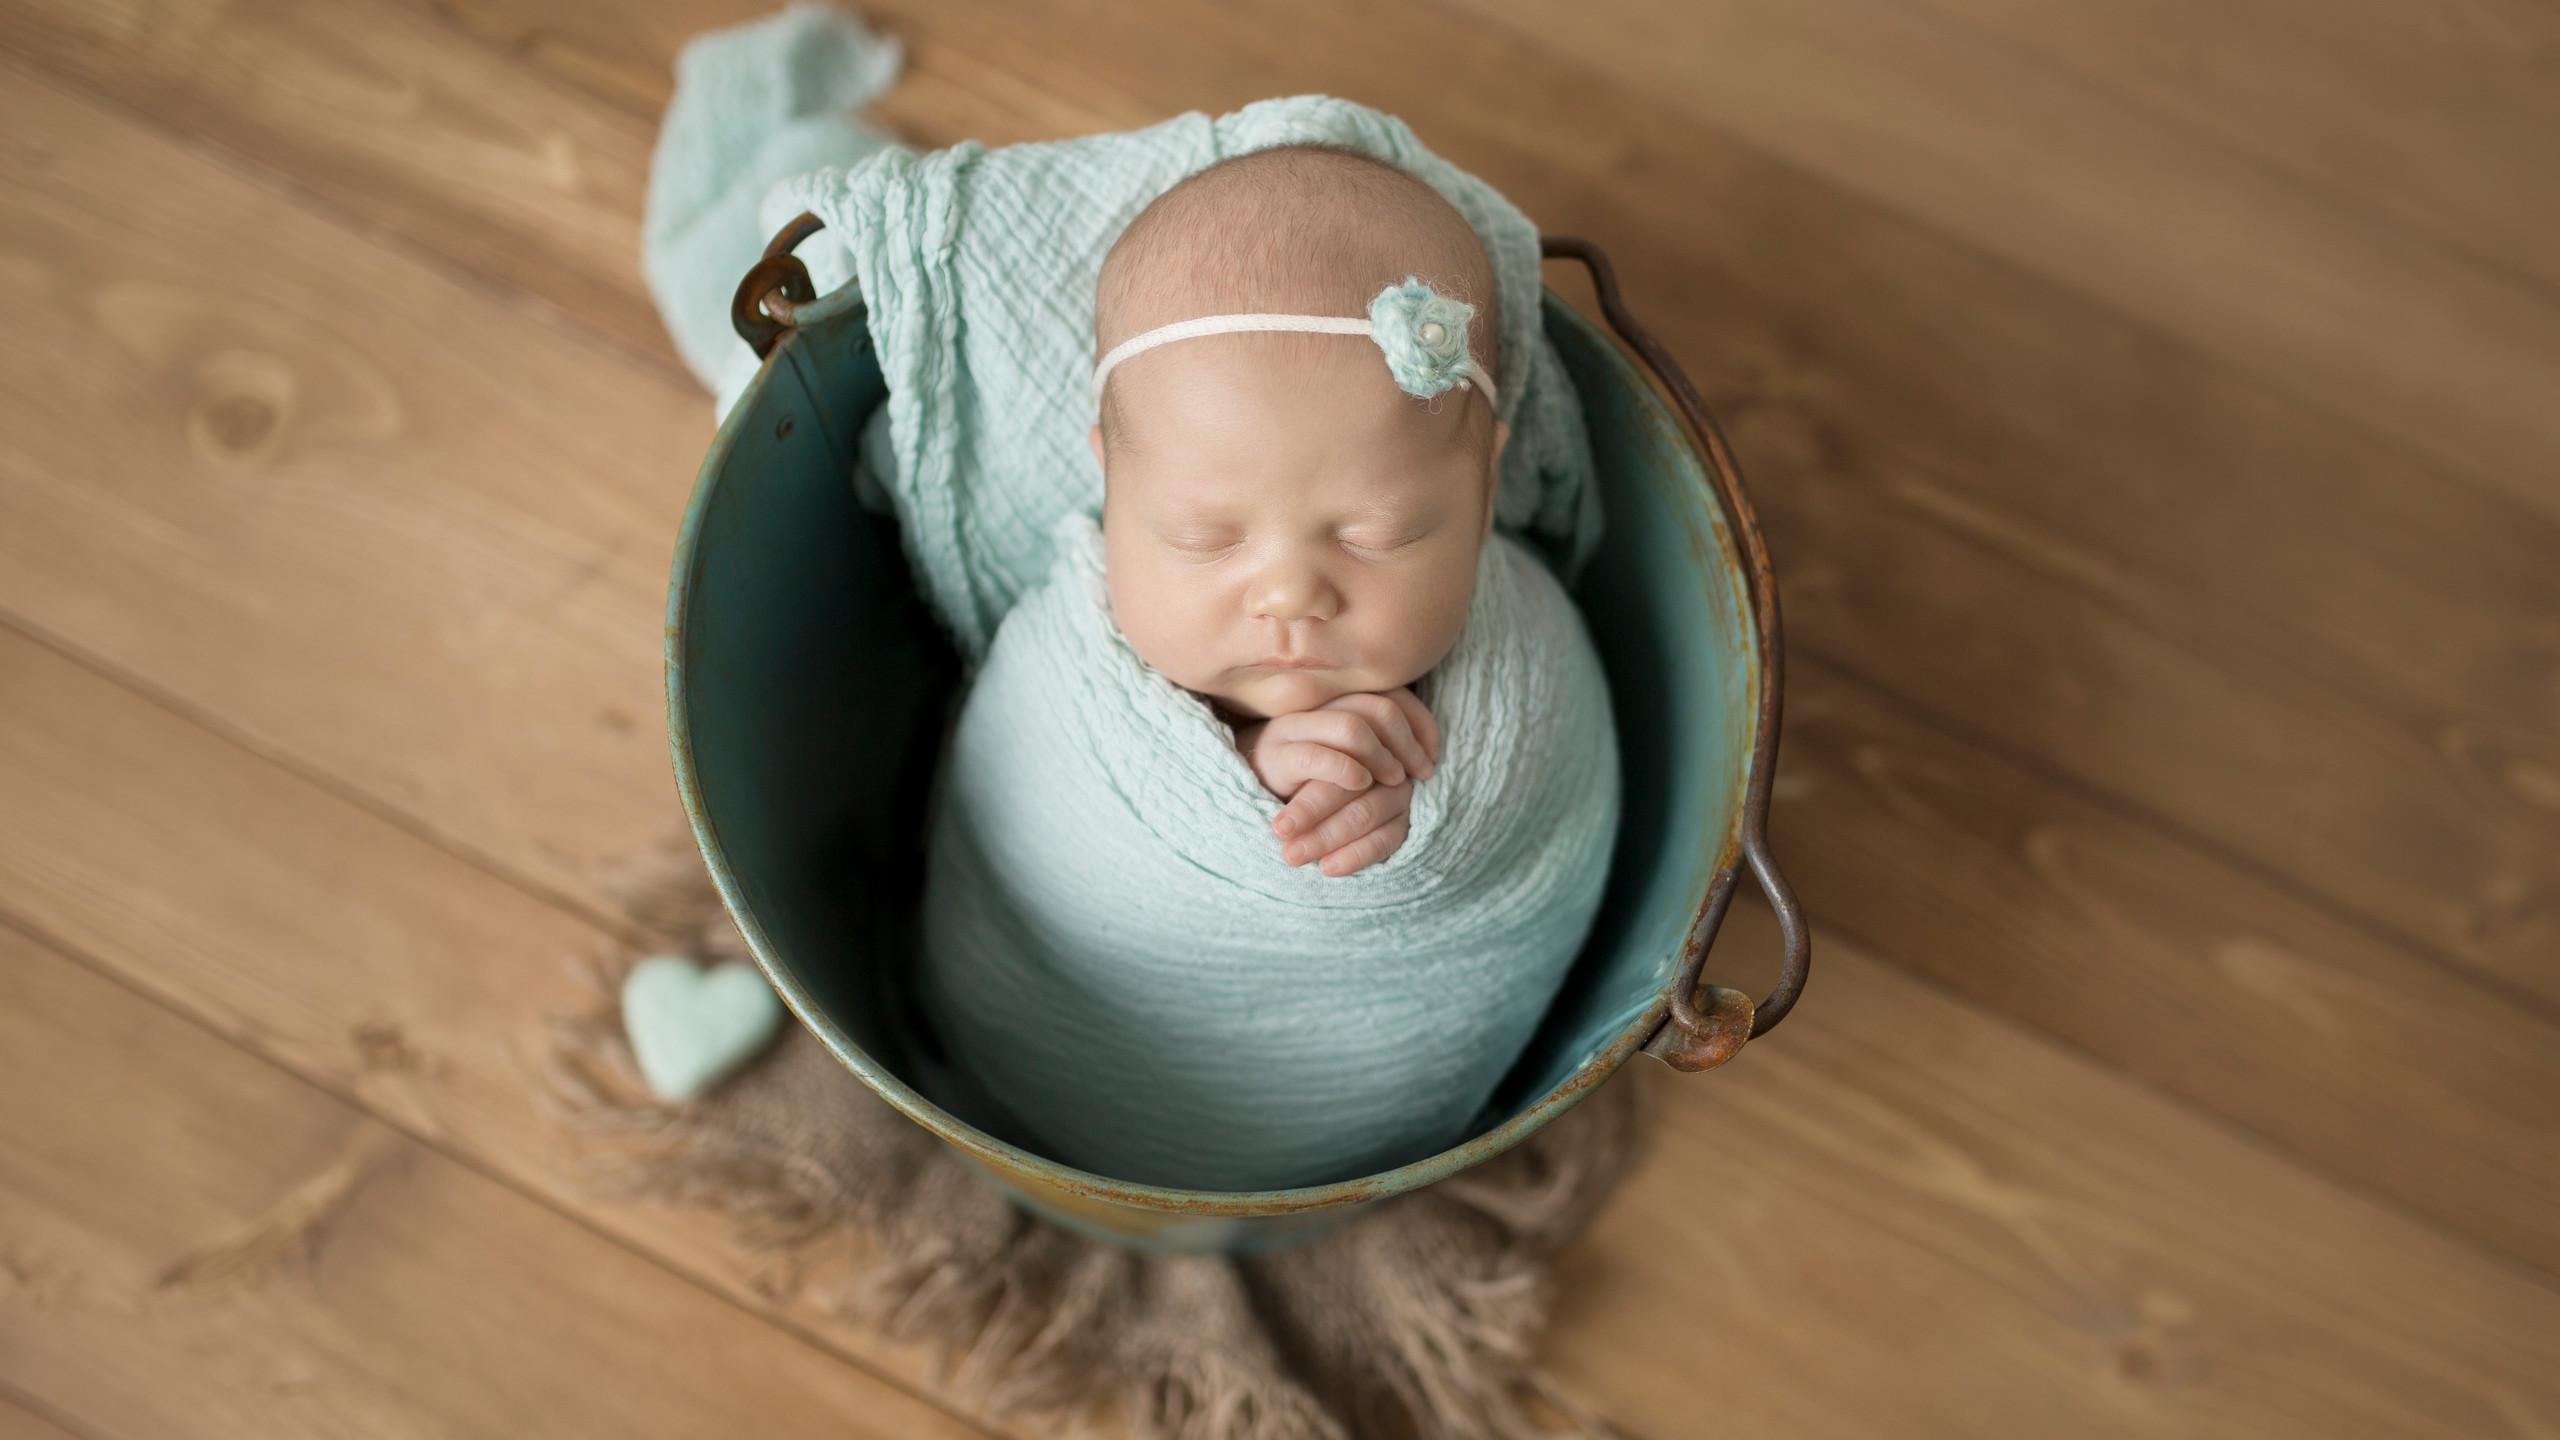 8 day old newborn